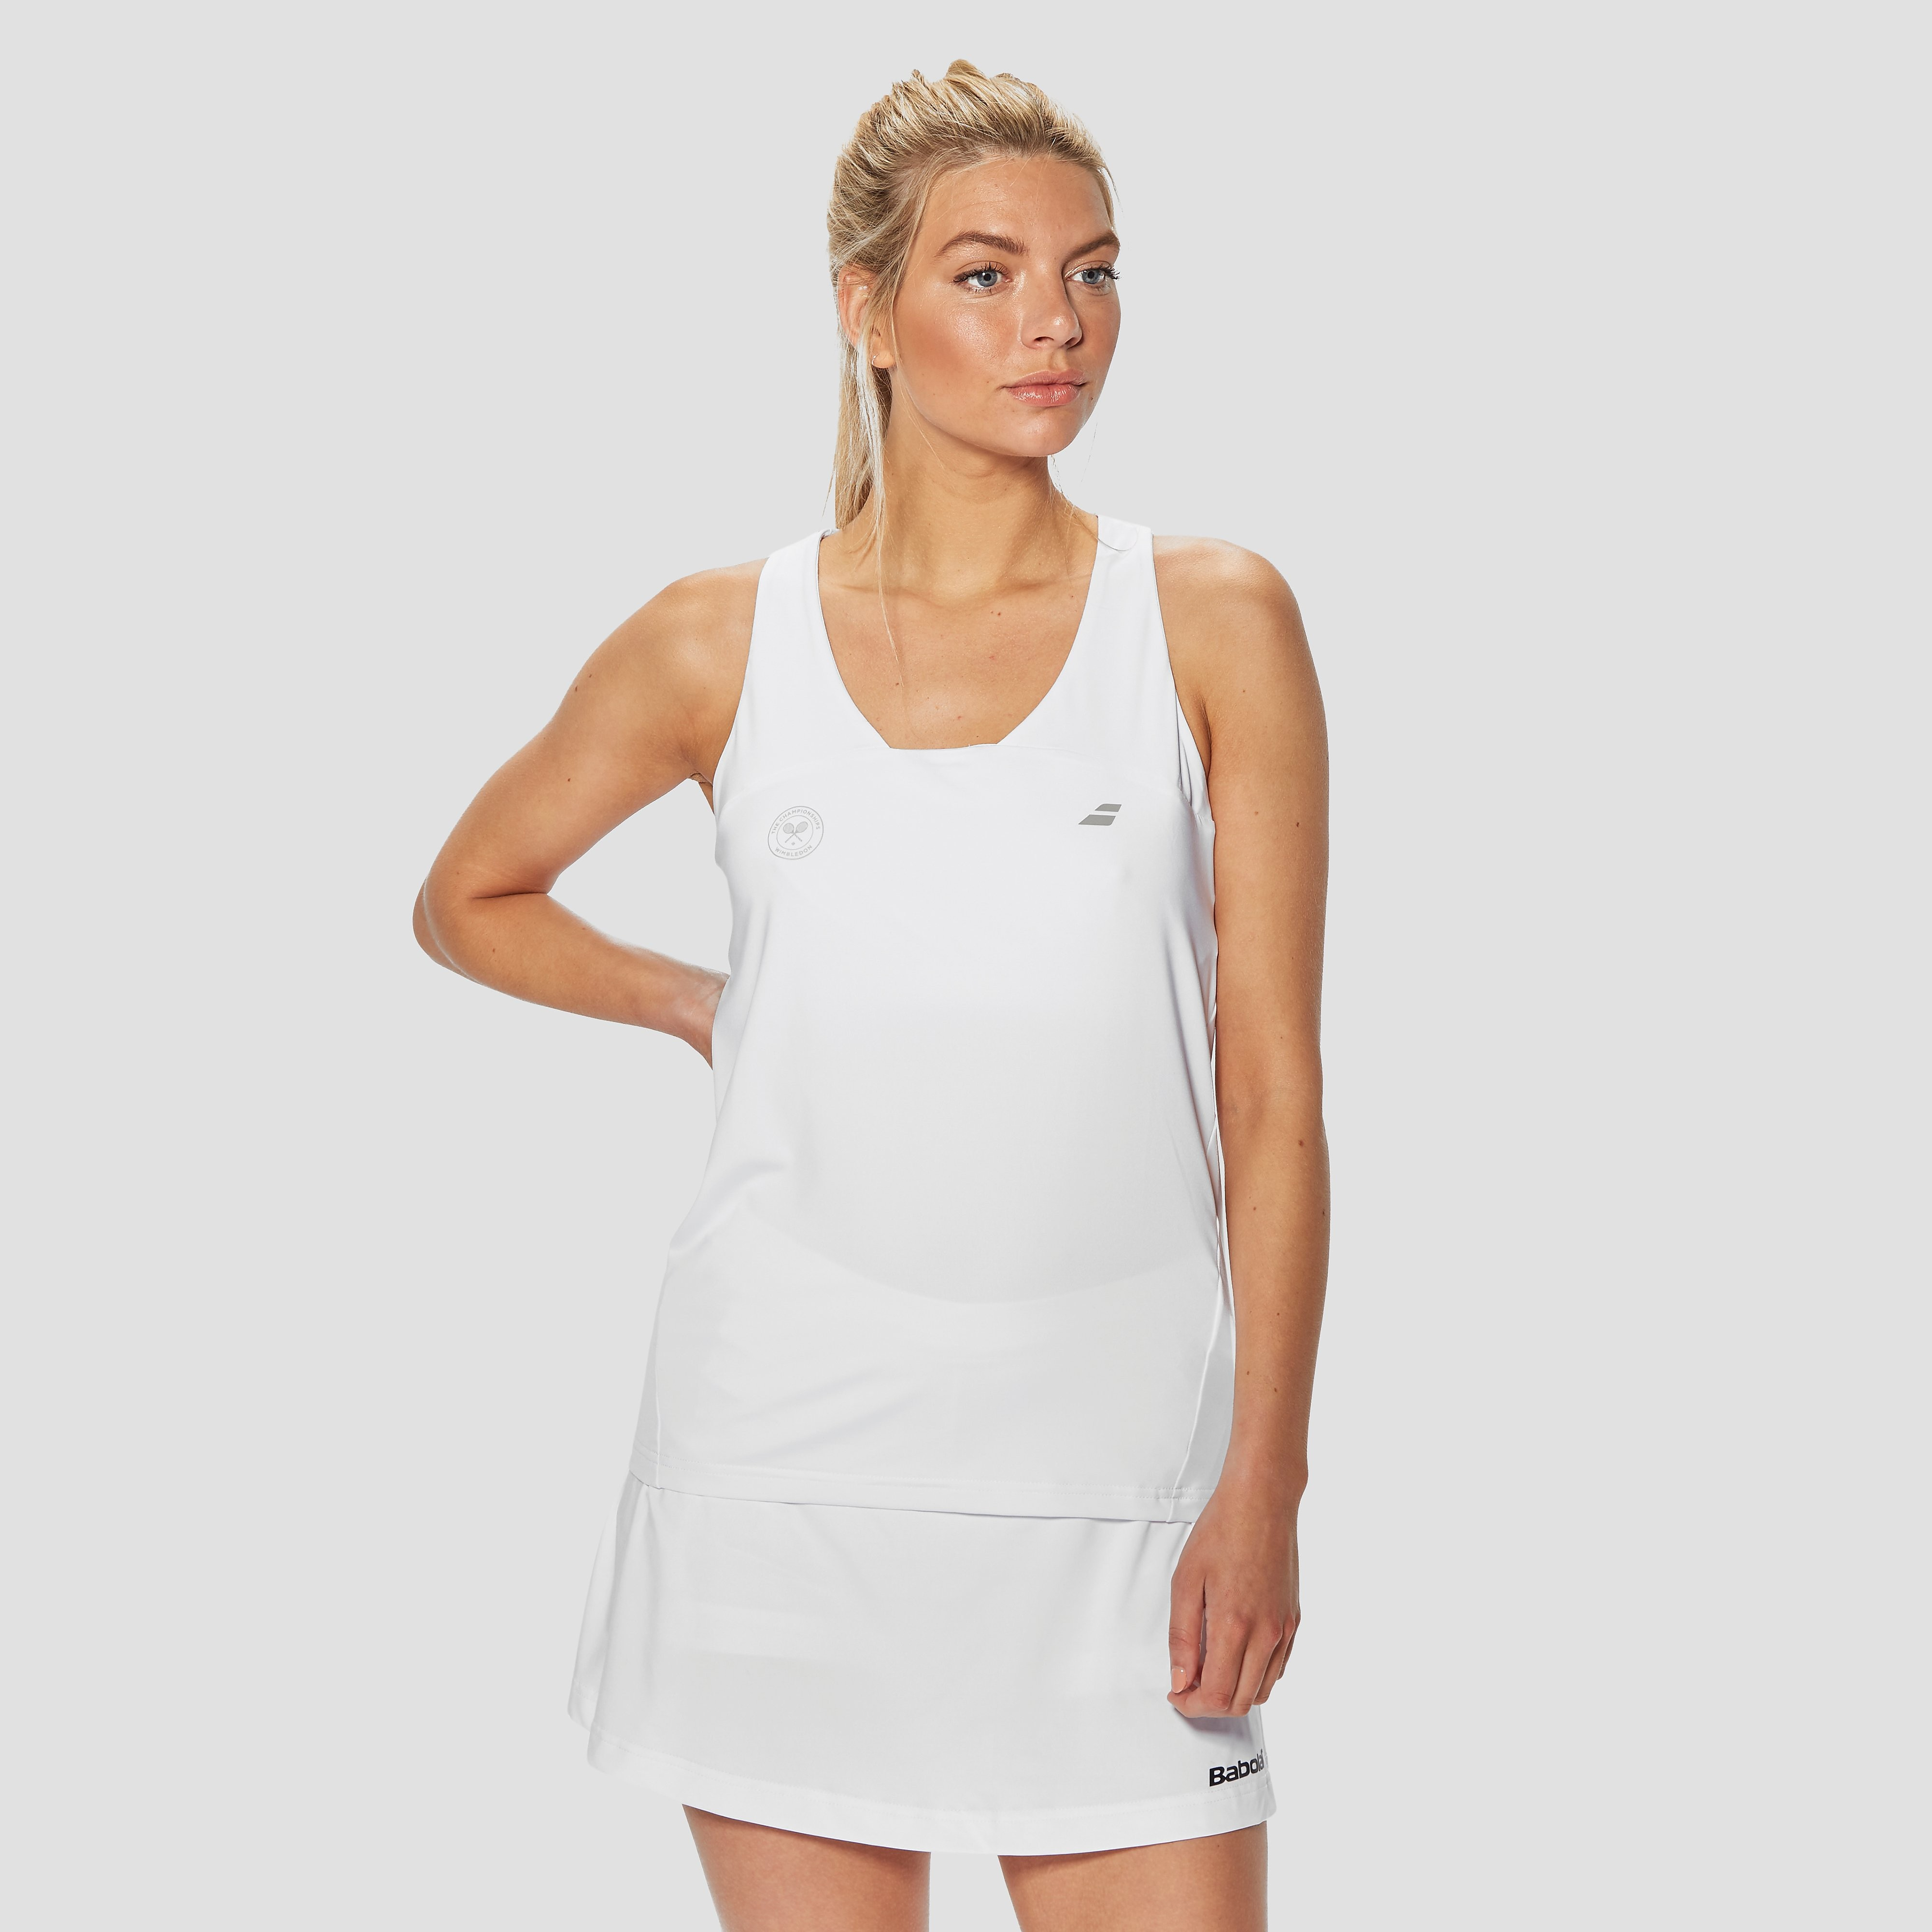 Babolat Wimbledon Performance Women's Racerback Dress